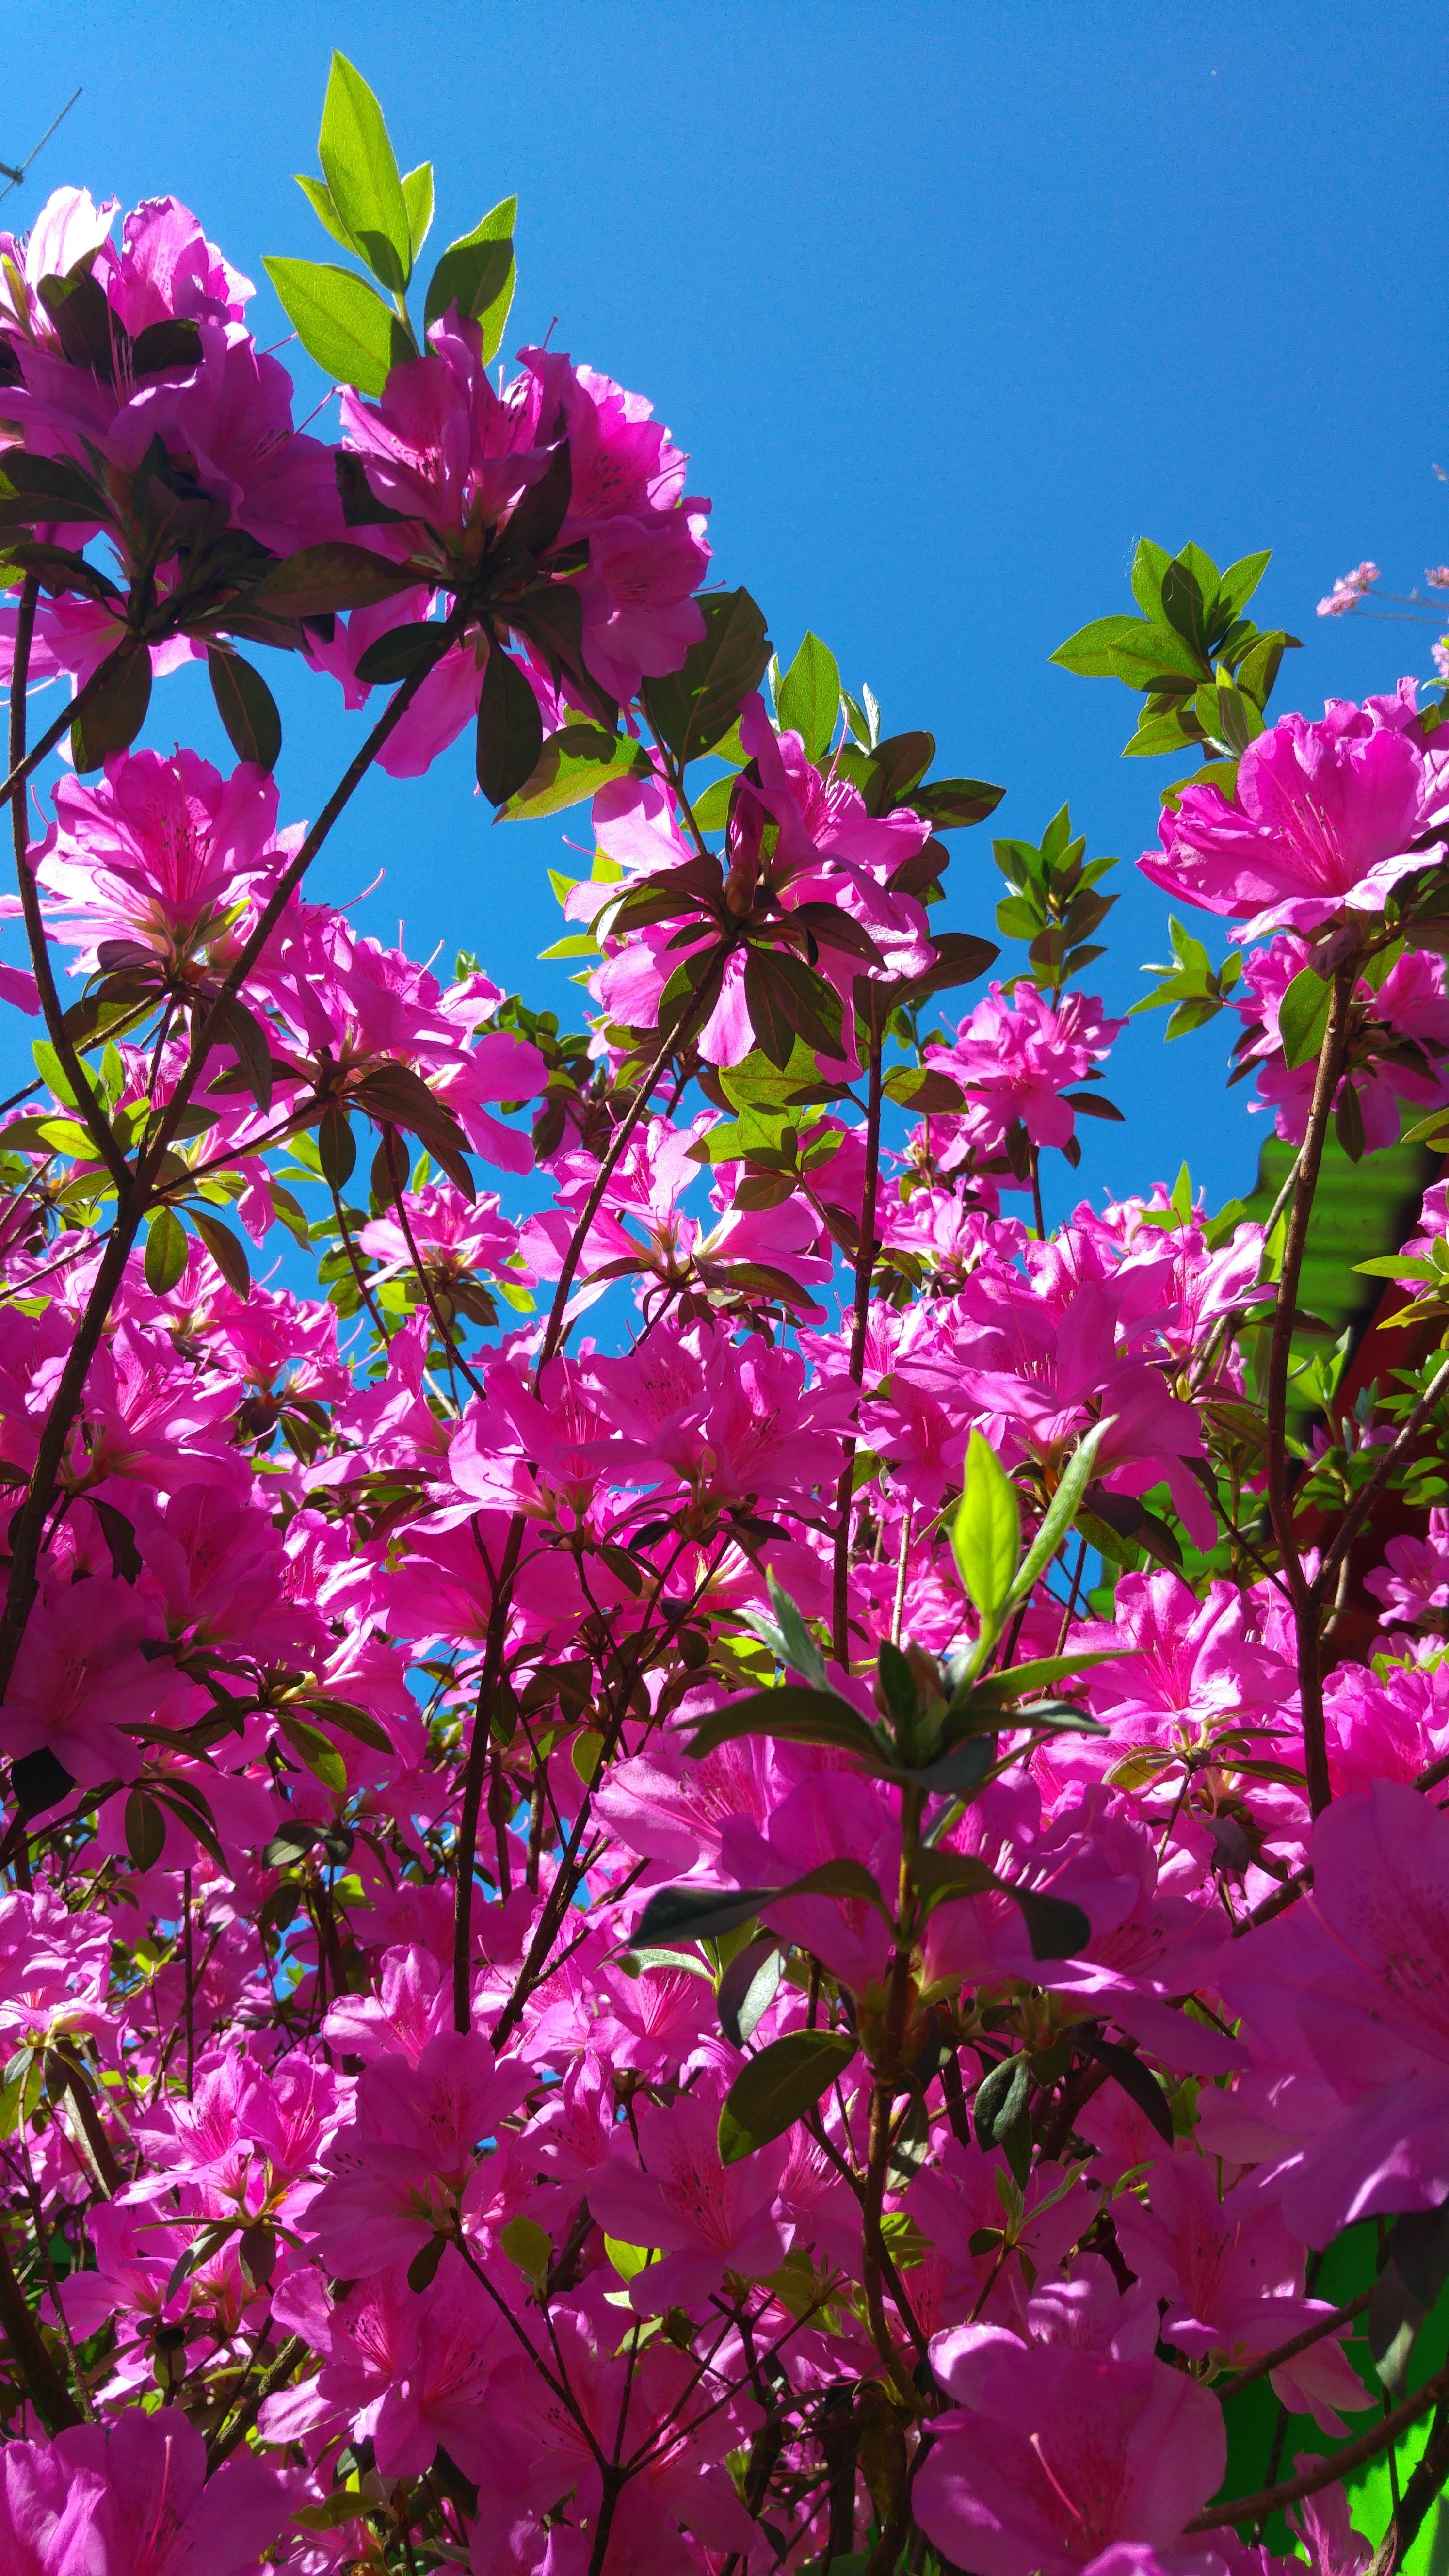 Fotos Gratis Arbol Rama Cielo Hoja Petalo Botanica Azul Rosado Flora Flor Silvestre Arbusto Azalea Planta Floreciendo Planta Lenosa Planta De Tierra 2988x5312 548664 Imagenes Gratis Pxhere